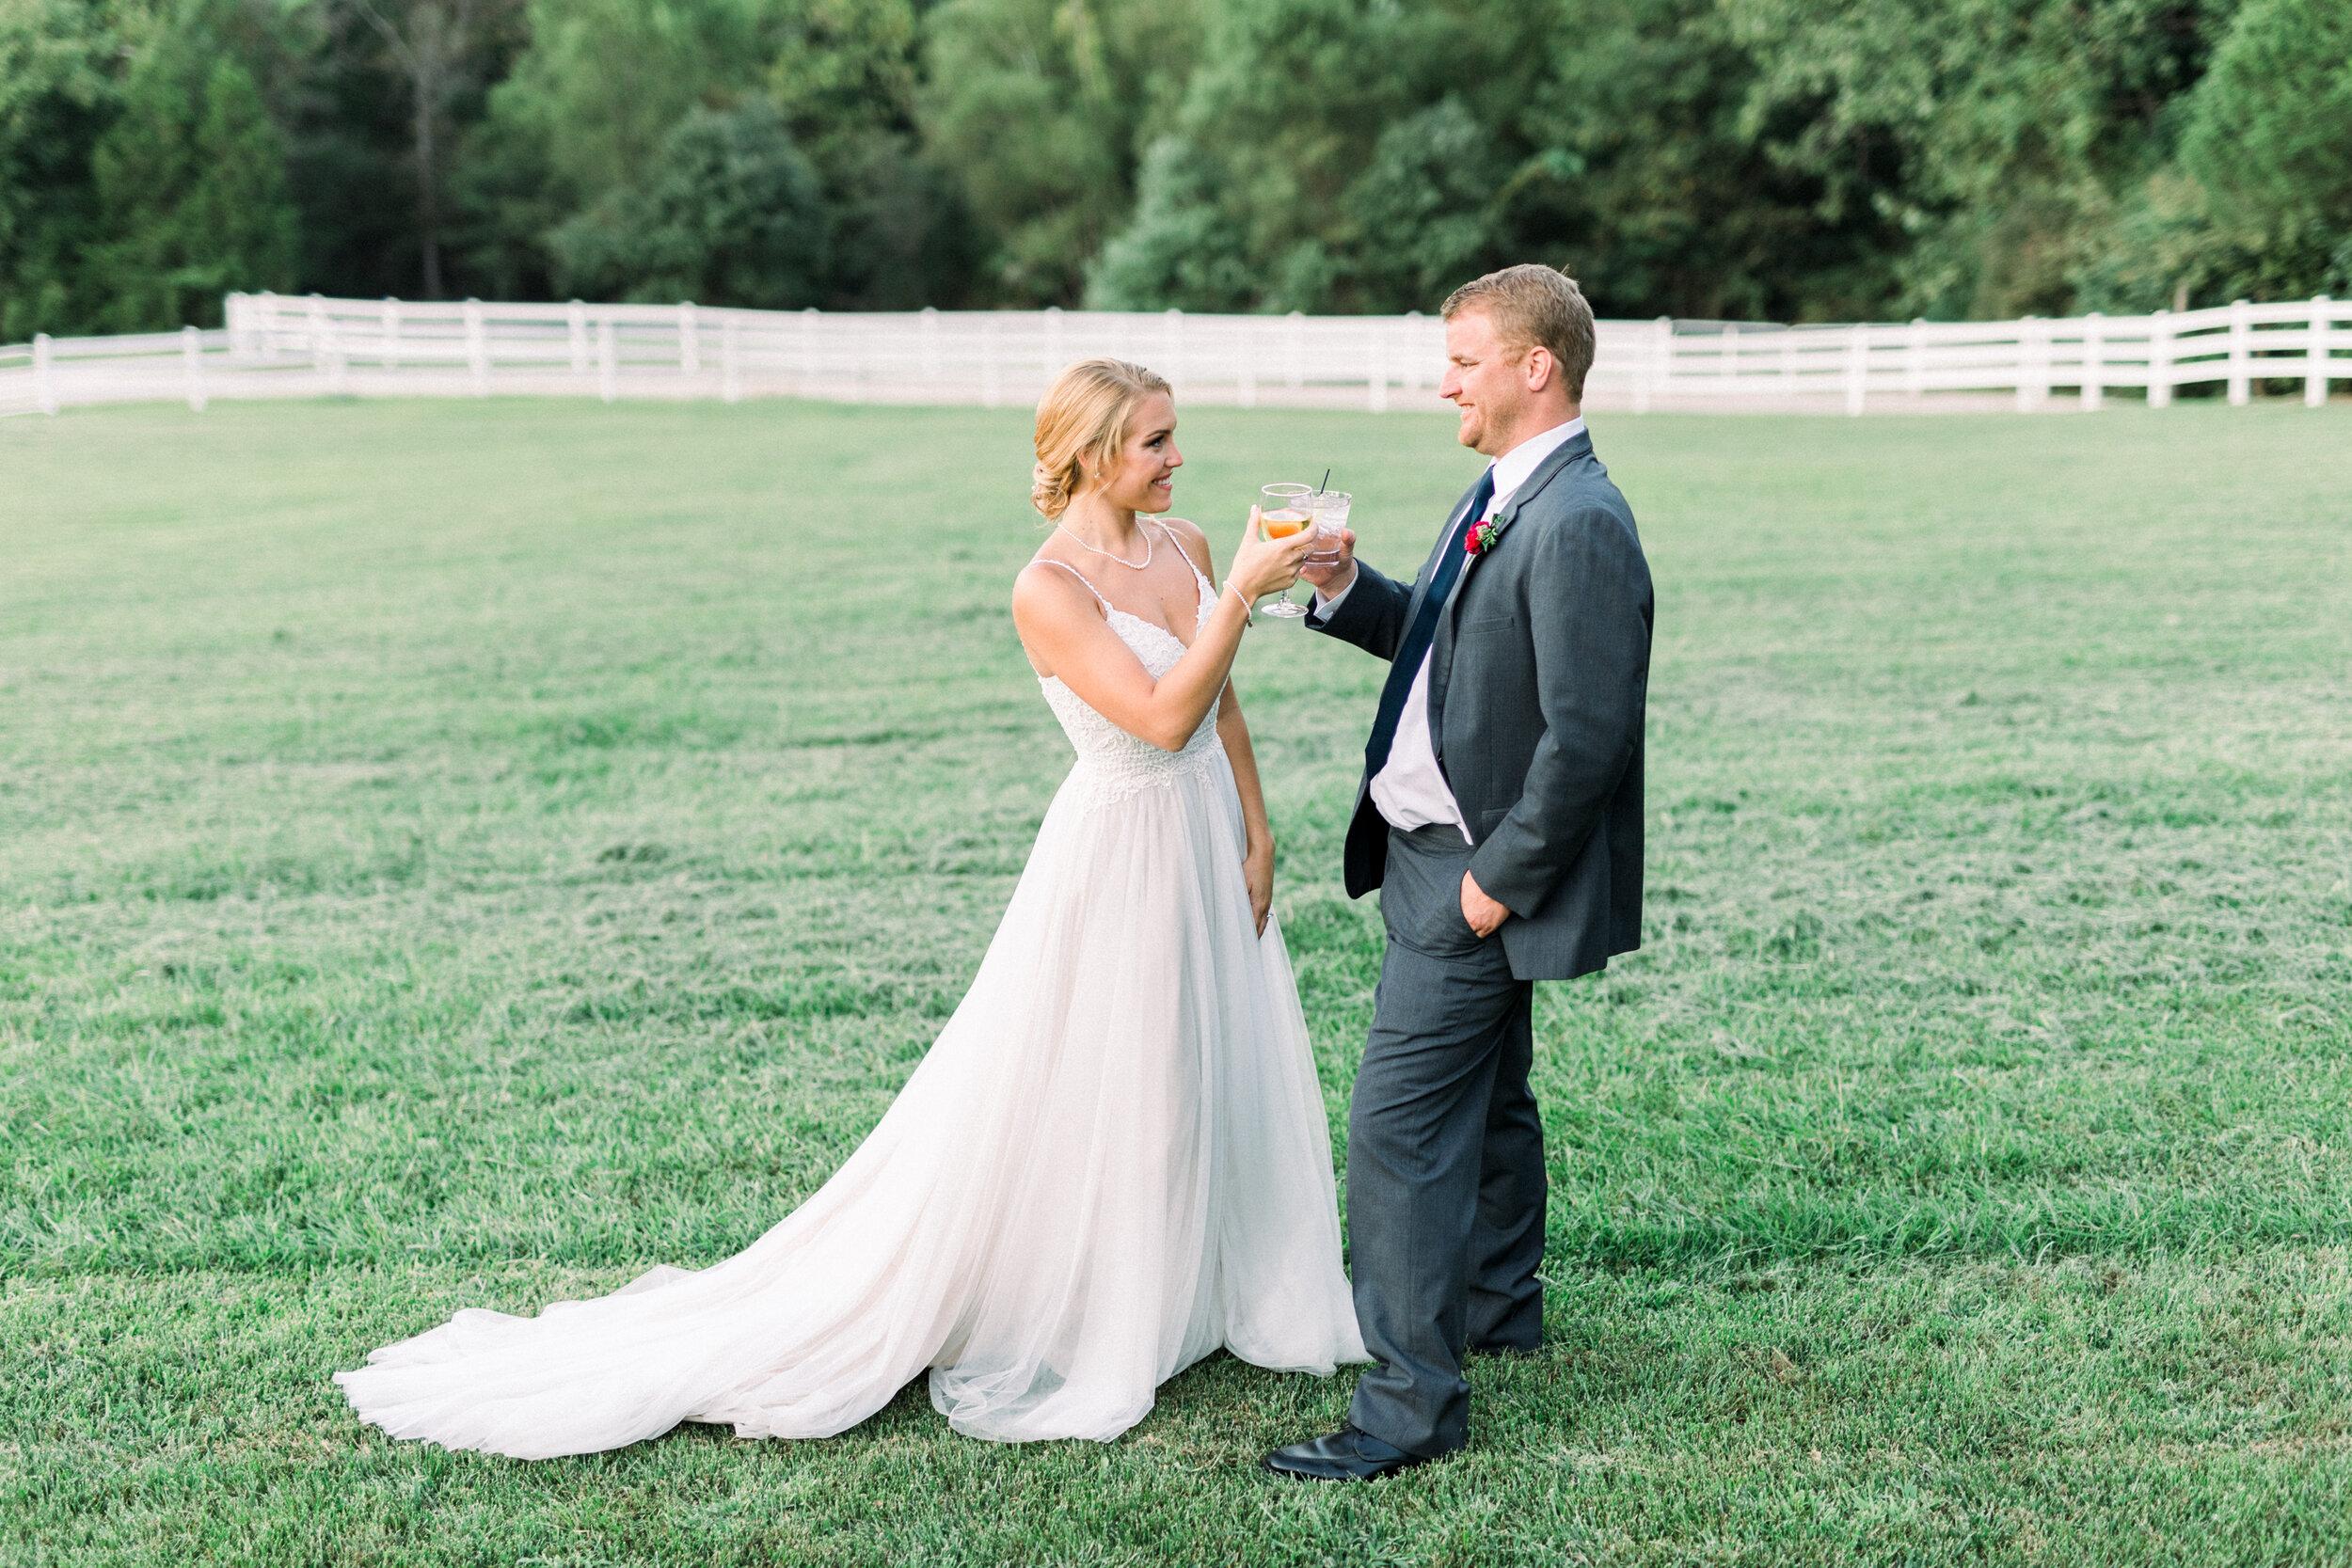 Kelsey + Jeff wedding 9-7-19 (620 of 890).jpg